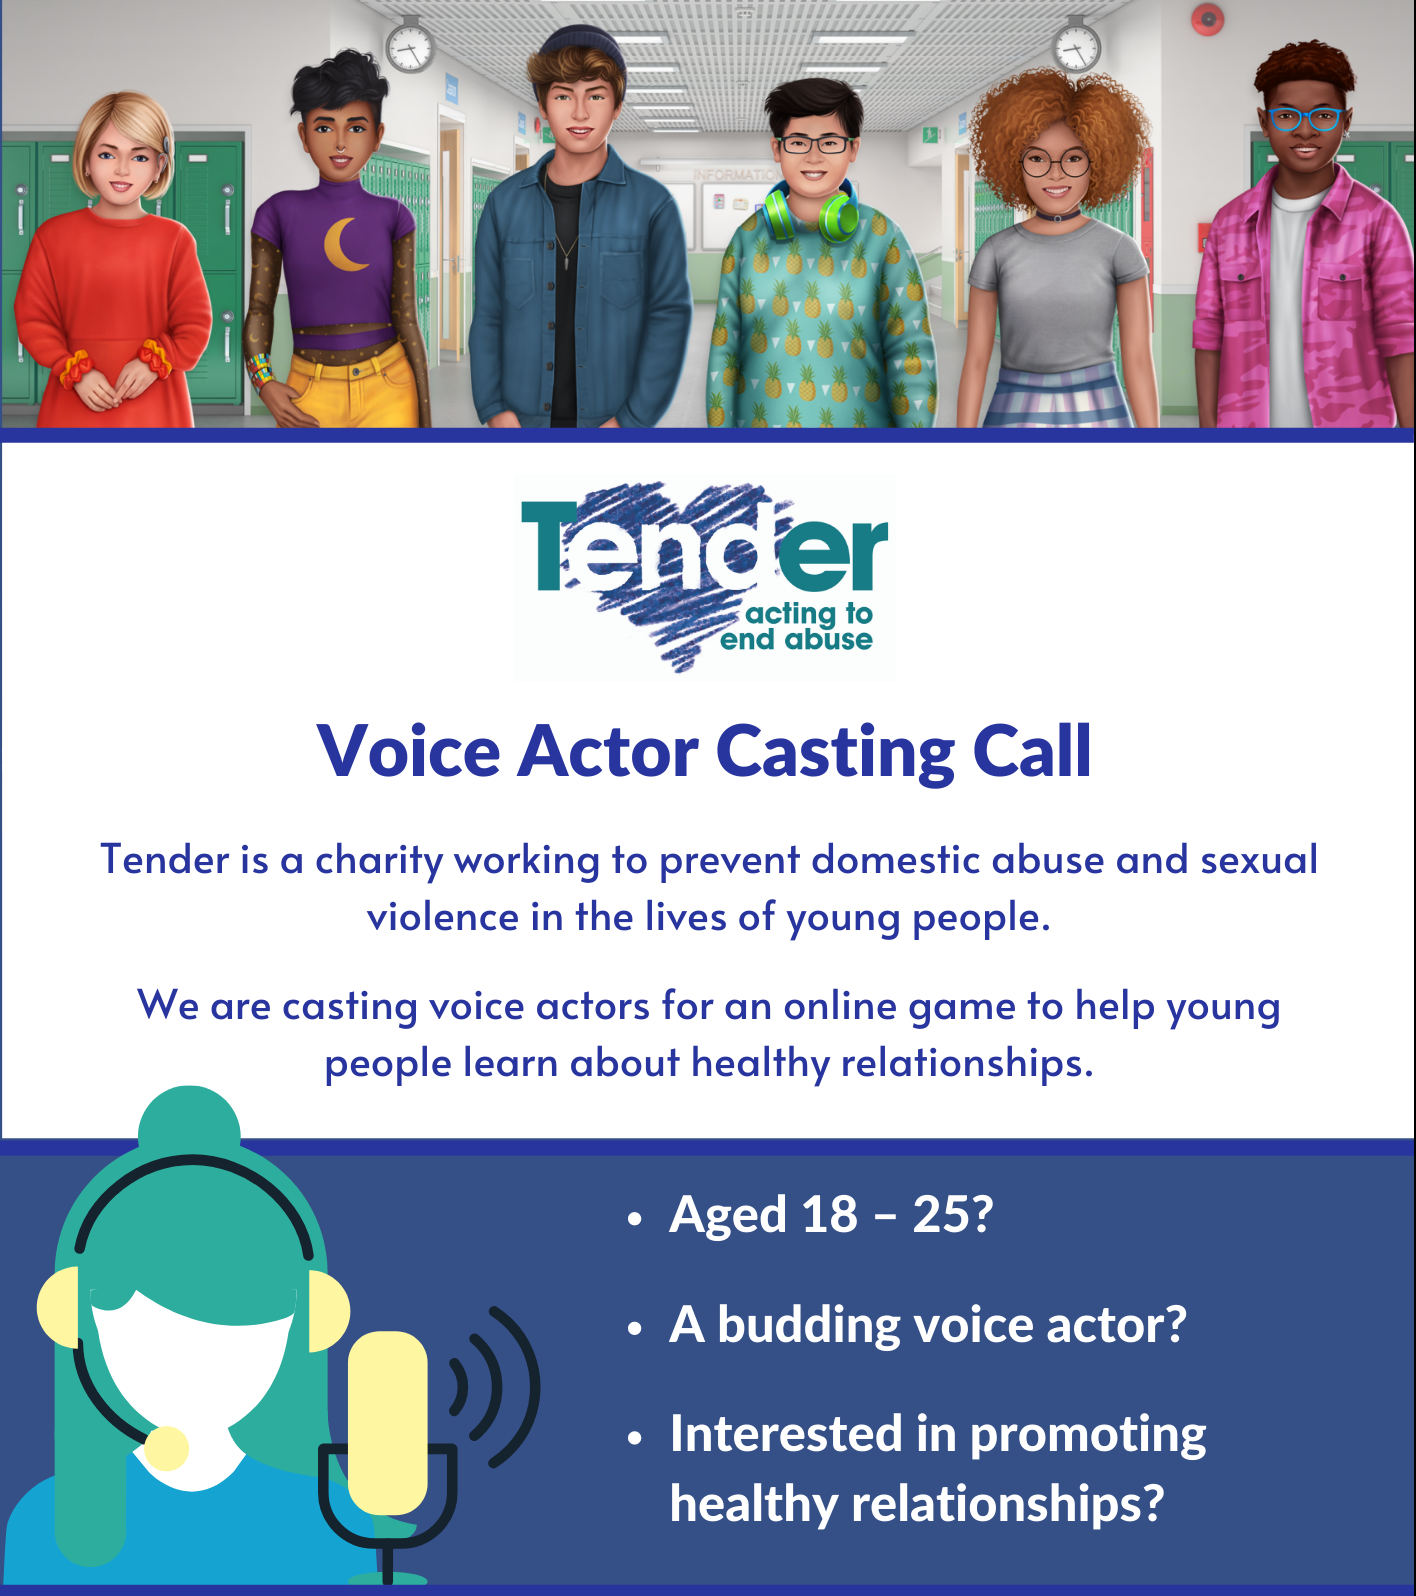 Casting Call - Voice Actors